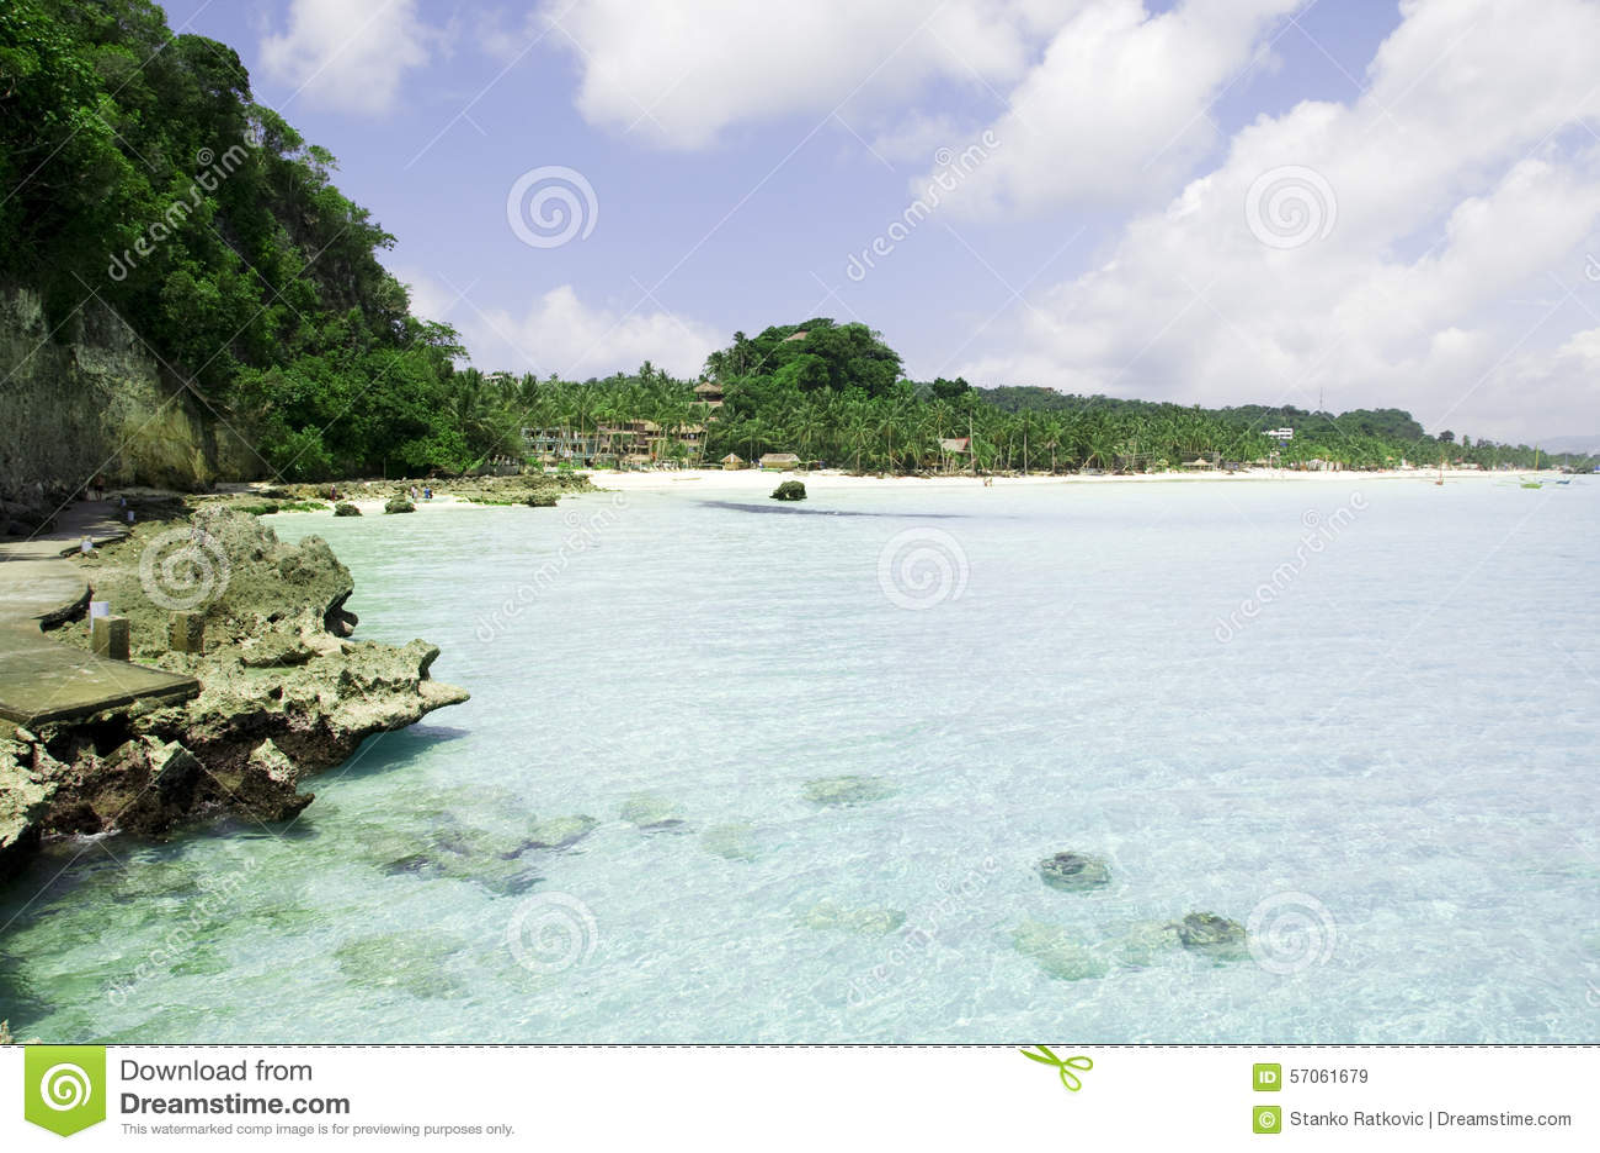 Strand met rotsen in water